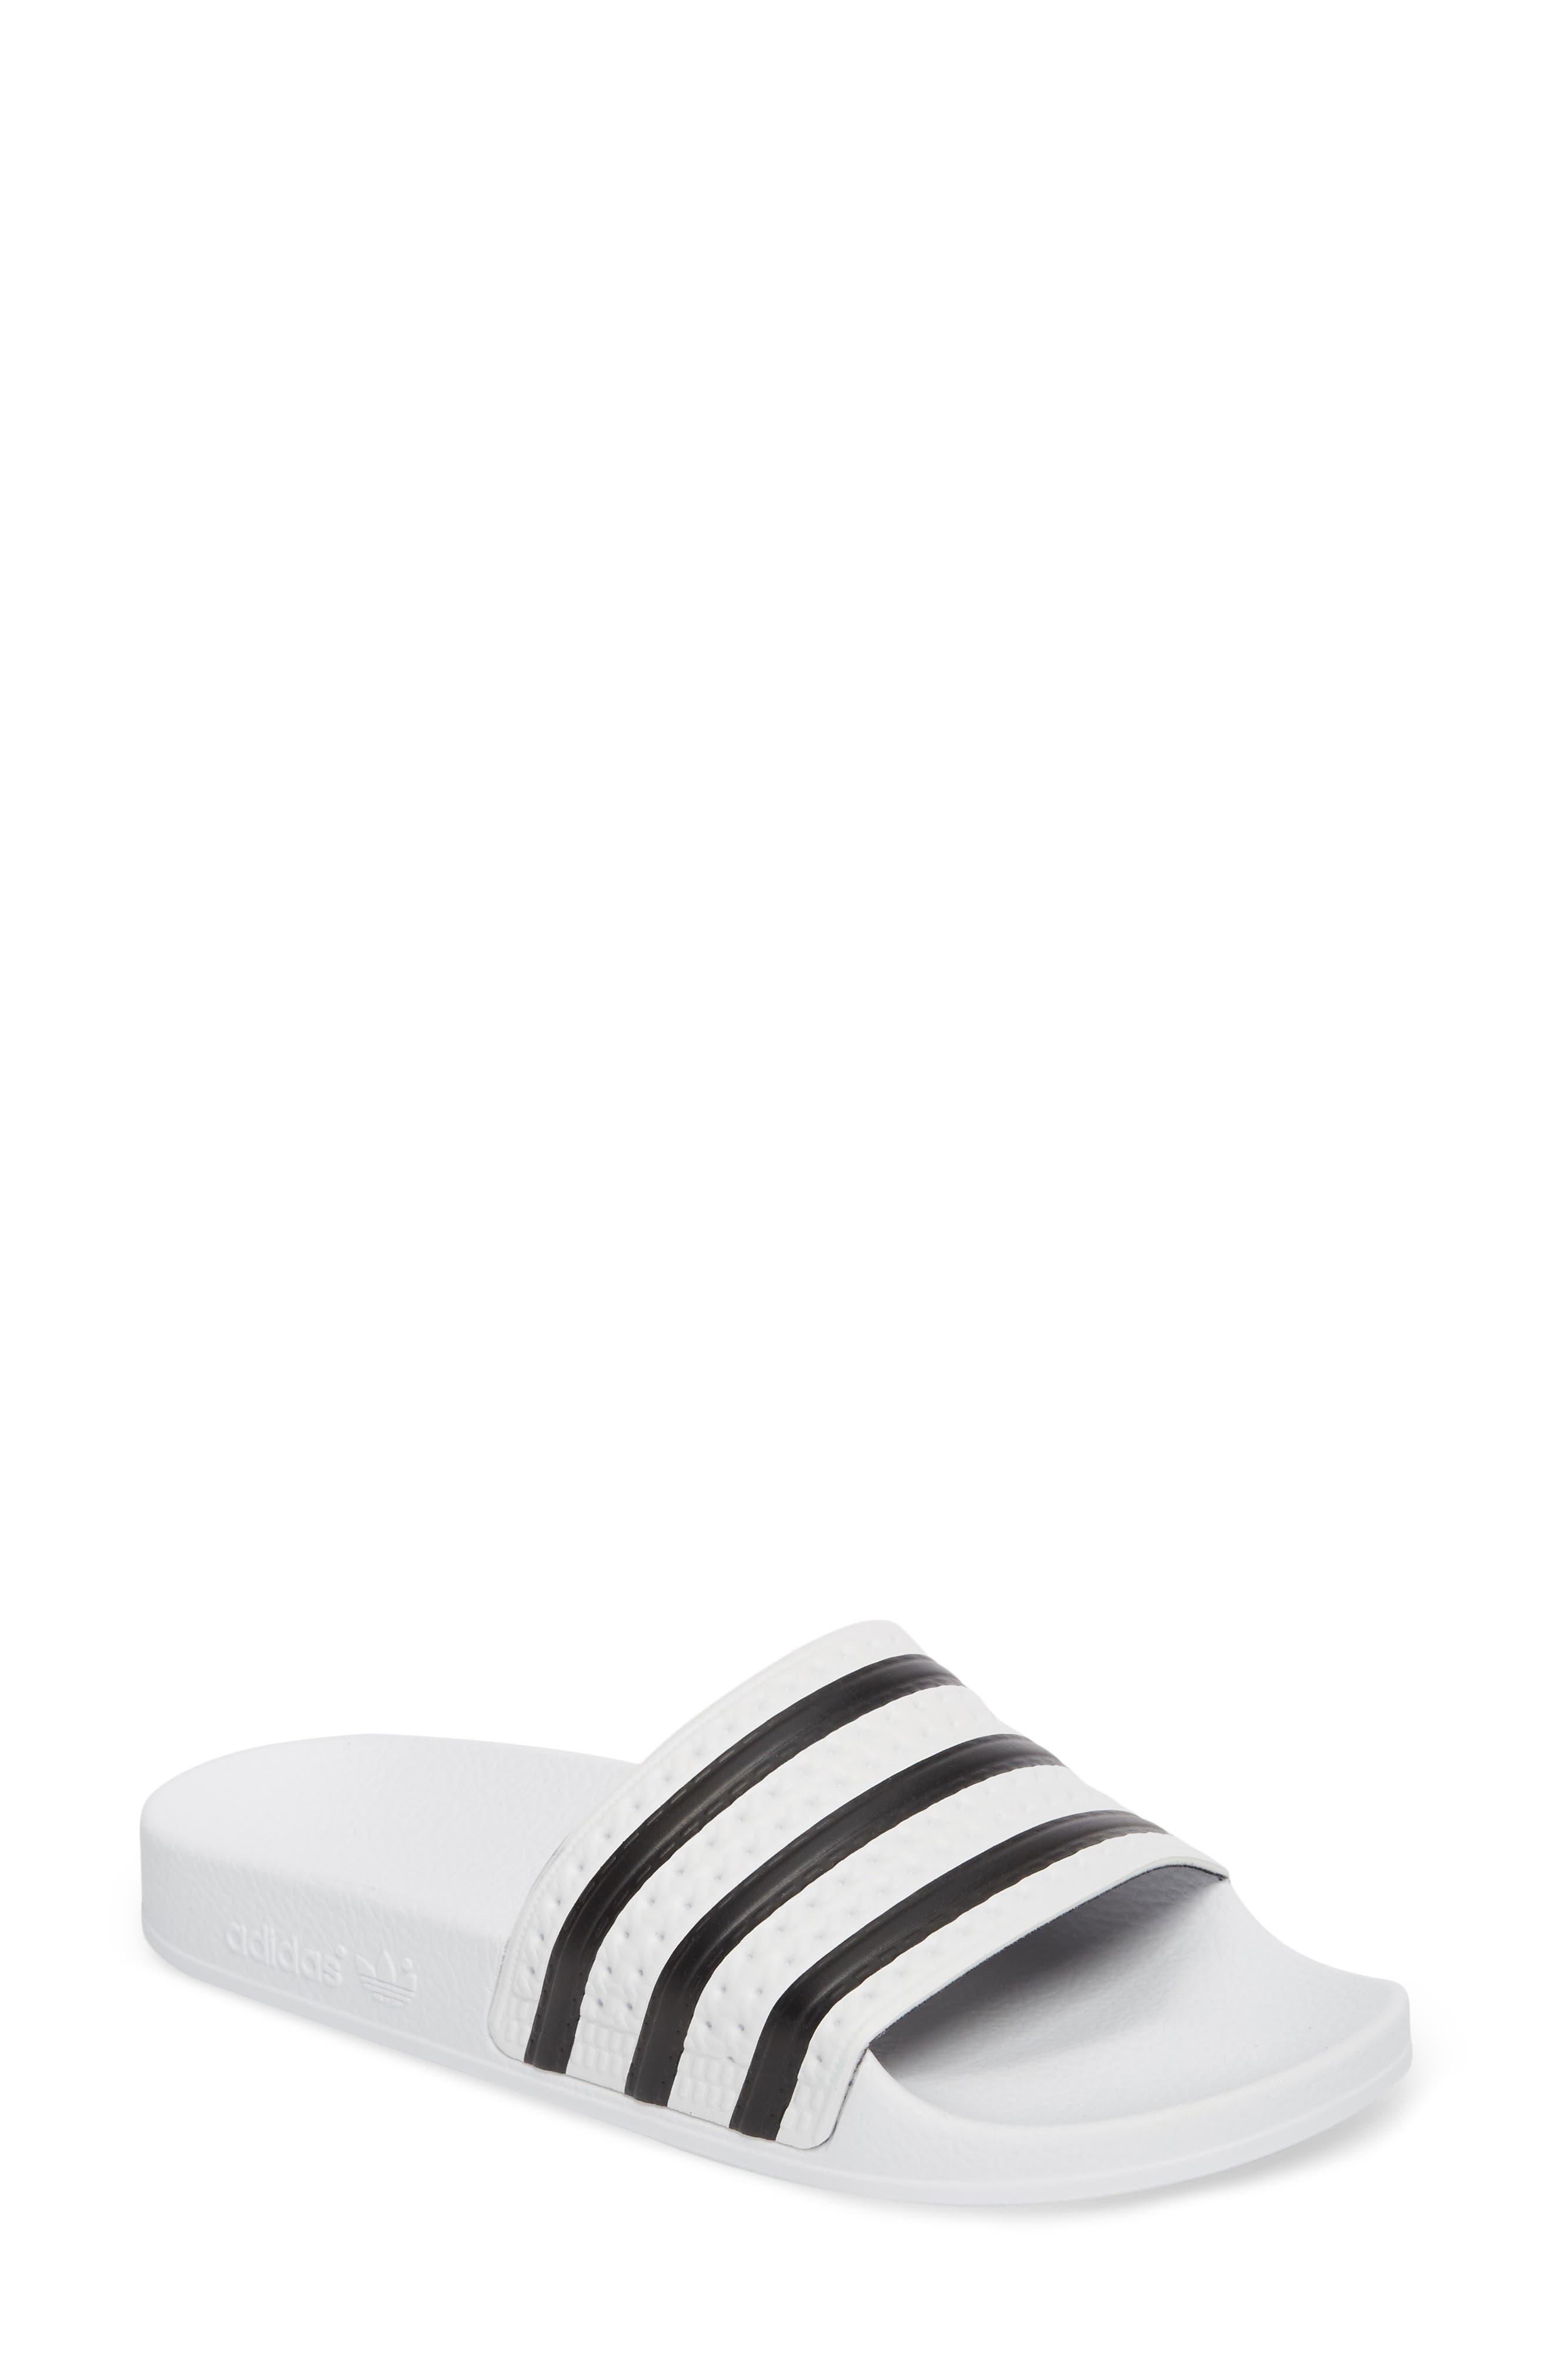 Main Image - adidas 'Adilette' Slide Sandal (Women)